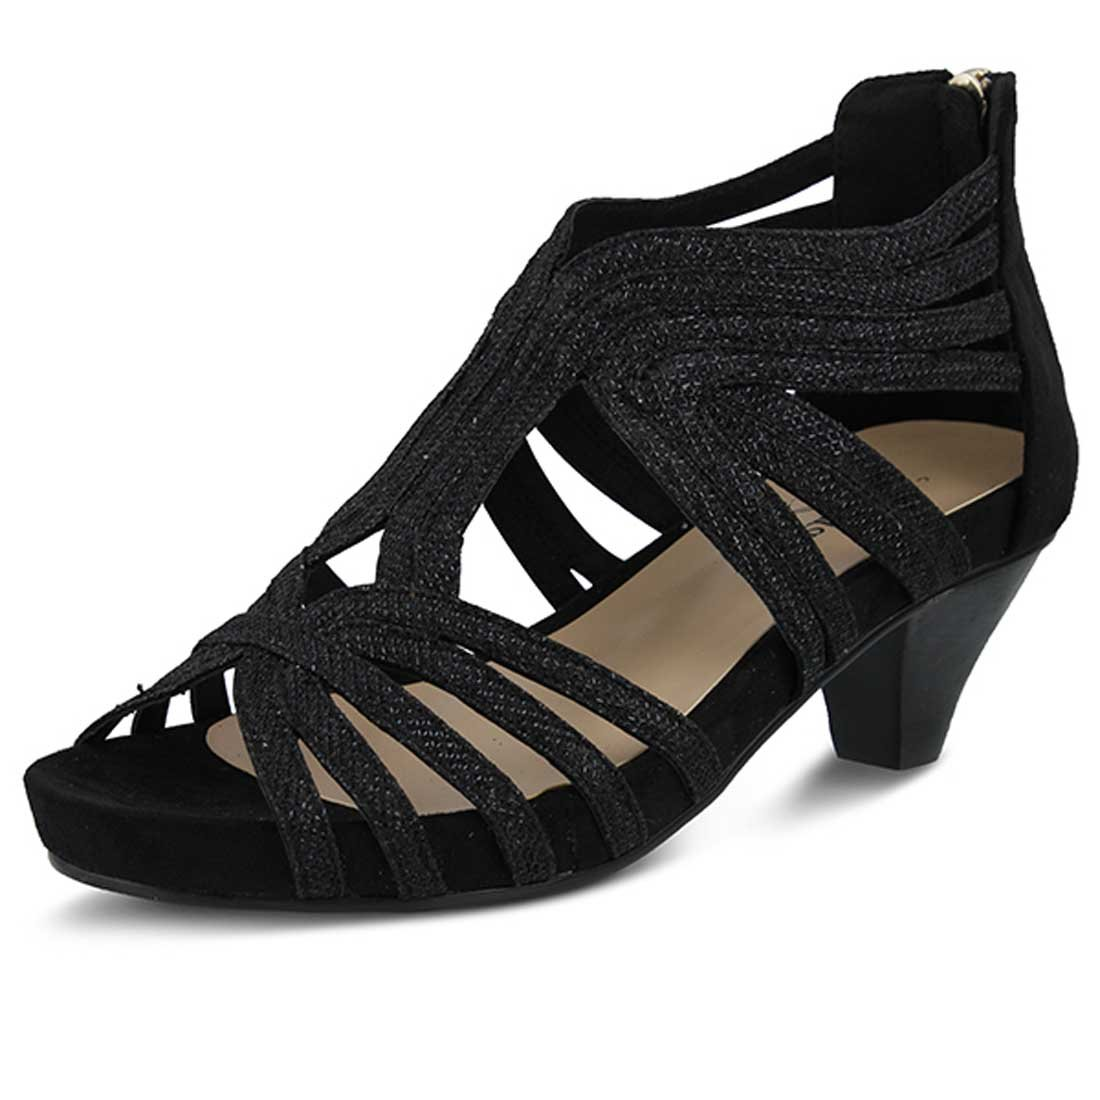 Azura Womens Esthetic Sandal B015RAPA52 38 M EU / 7.5-8 B(M) US|Black